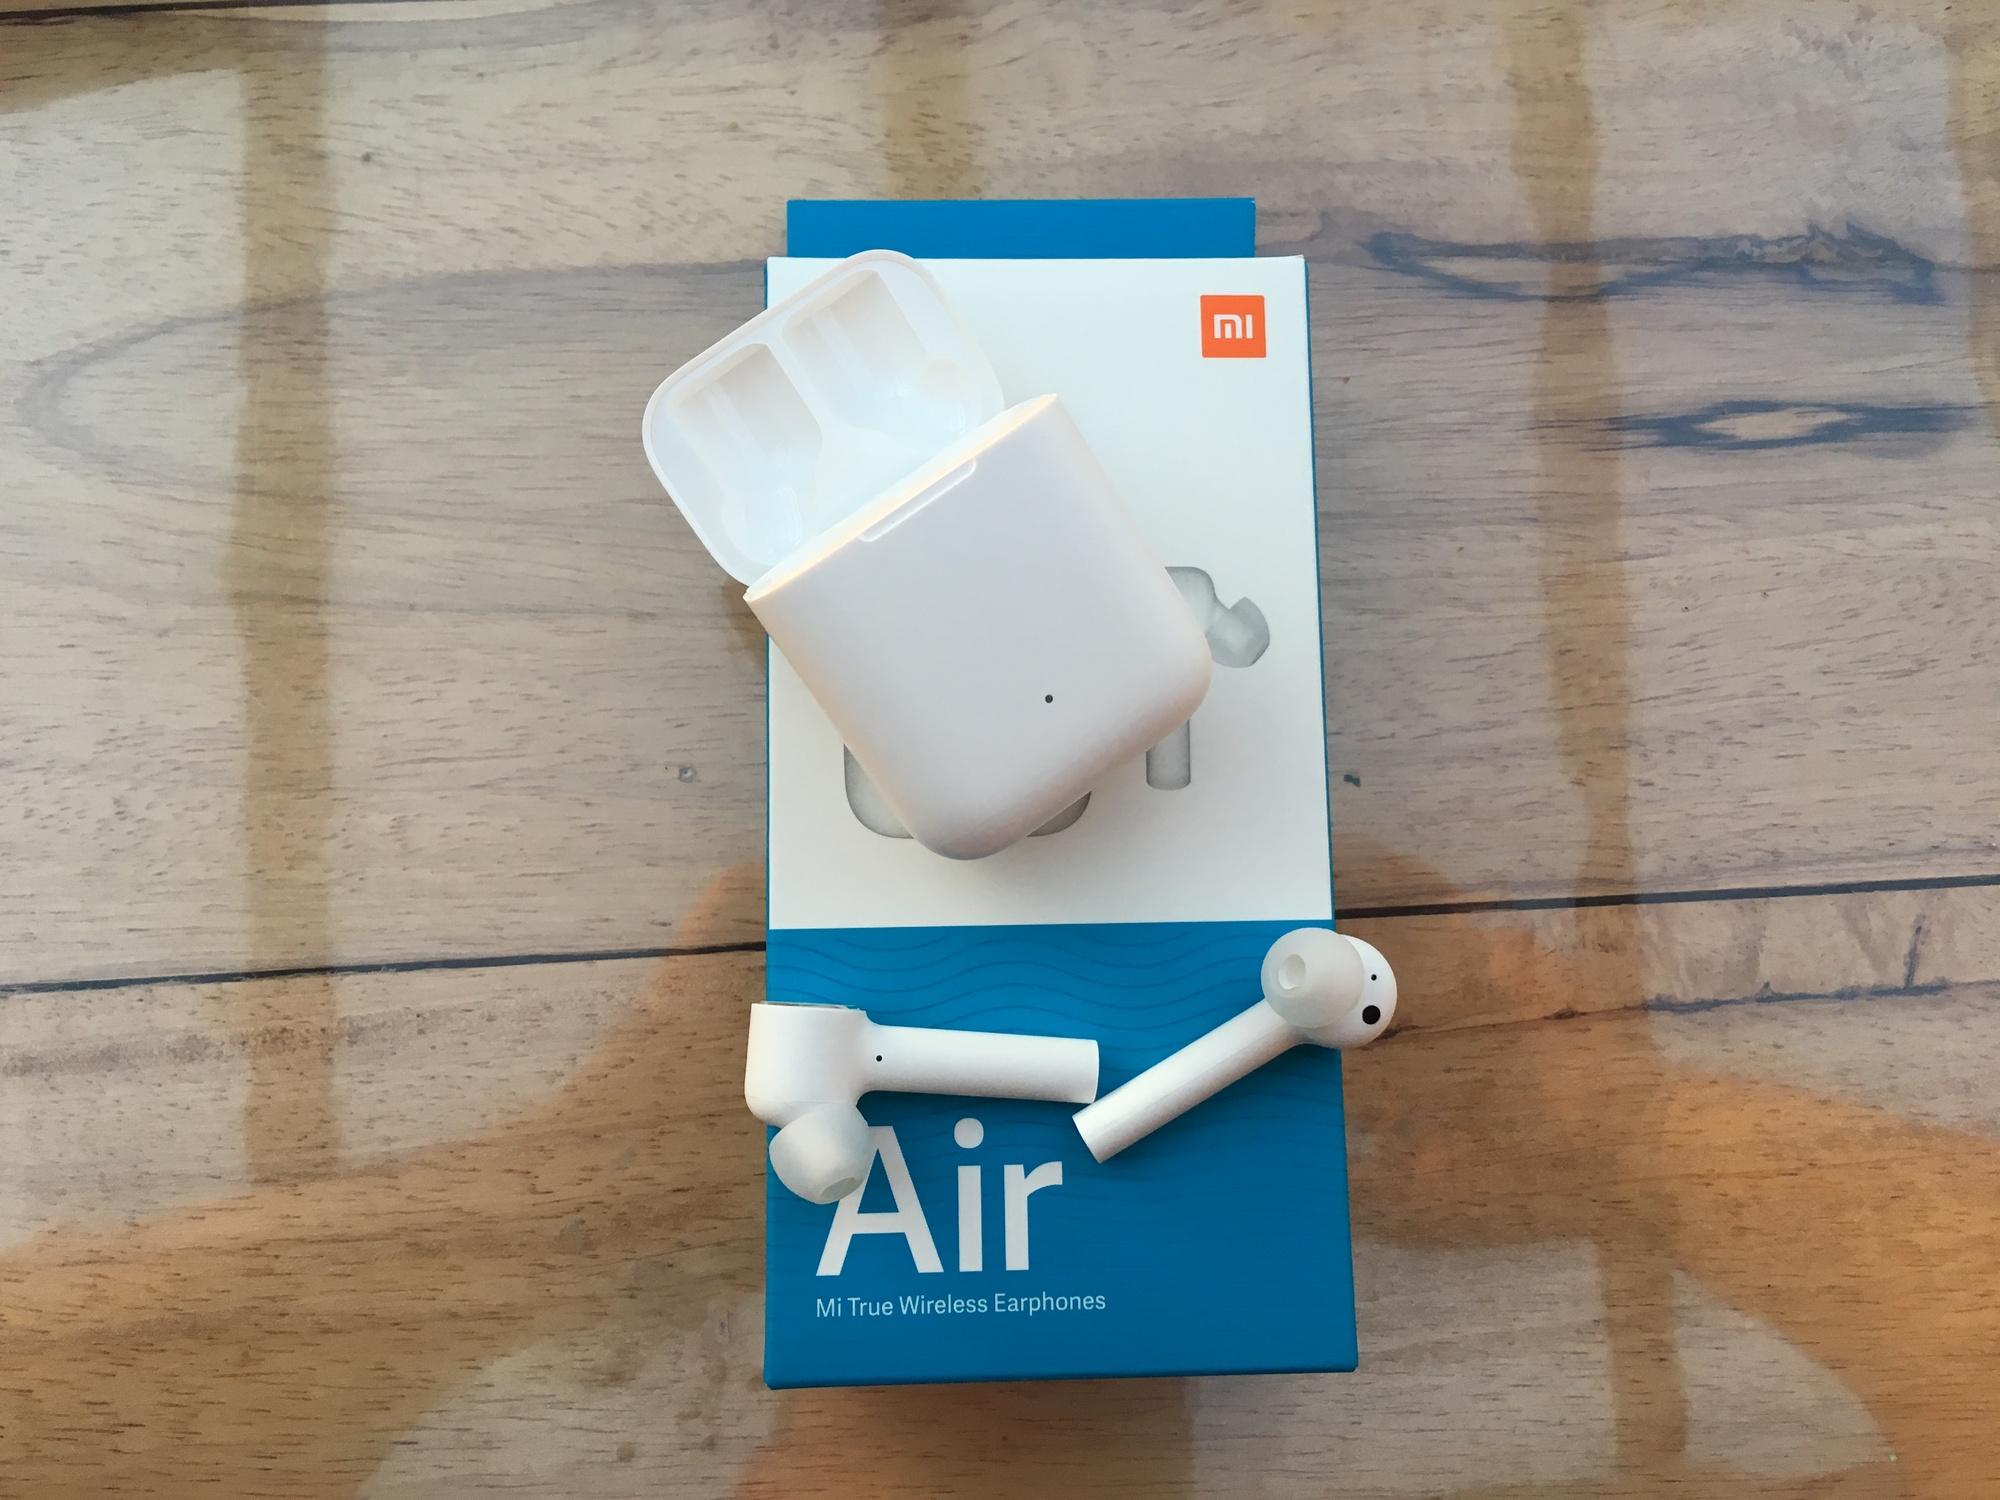 Mi True Wireless